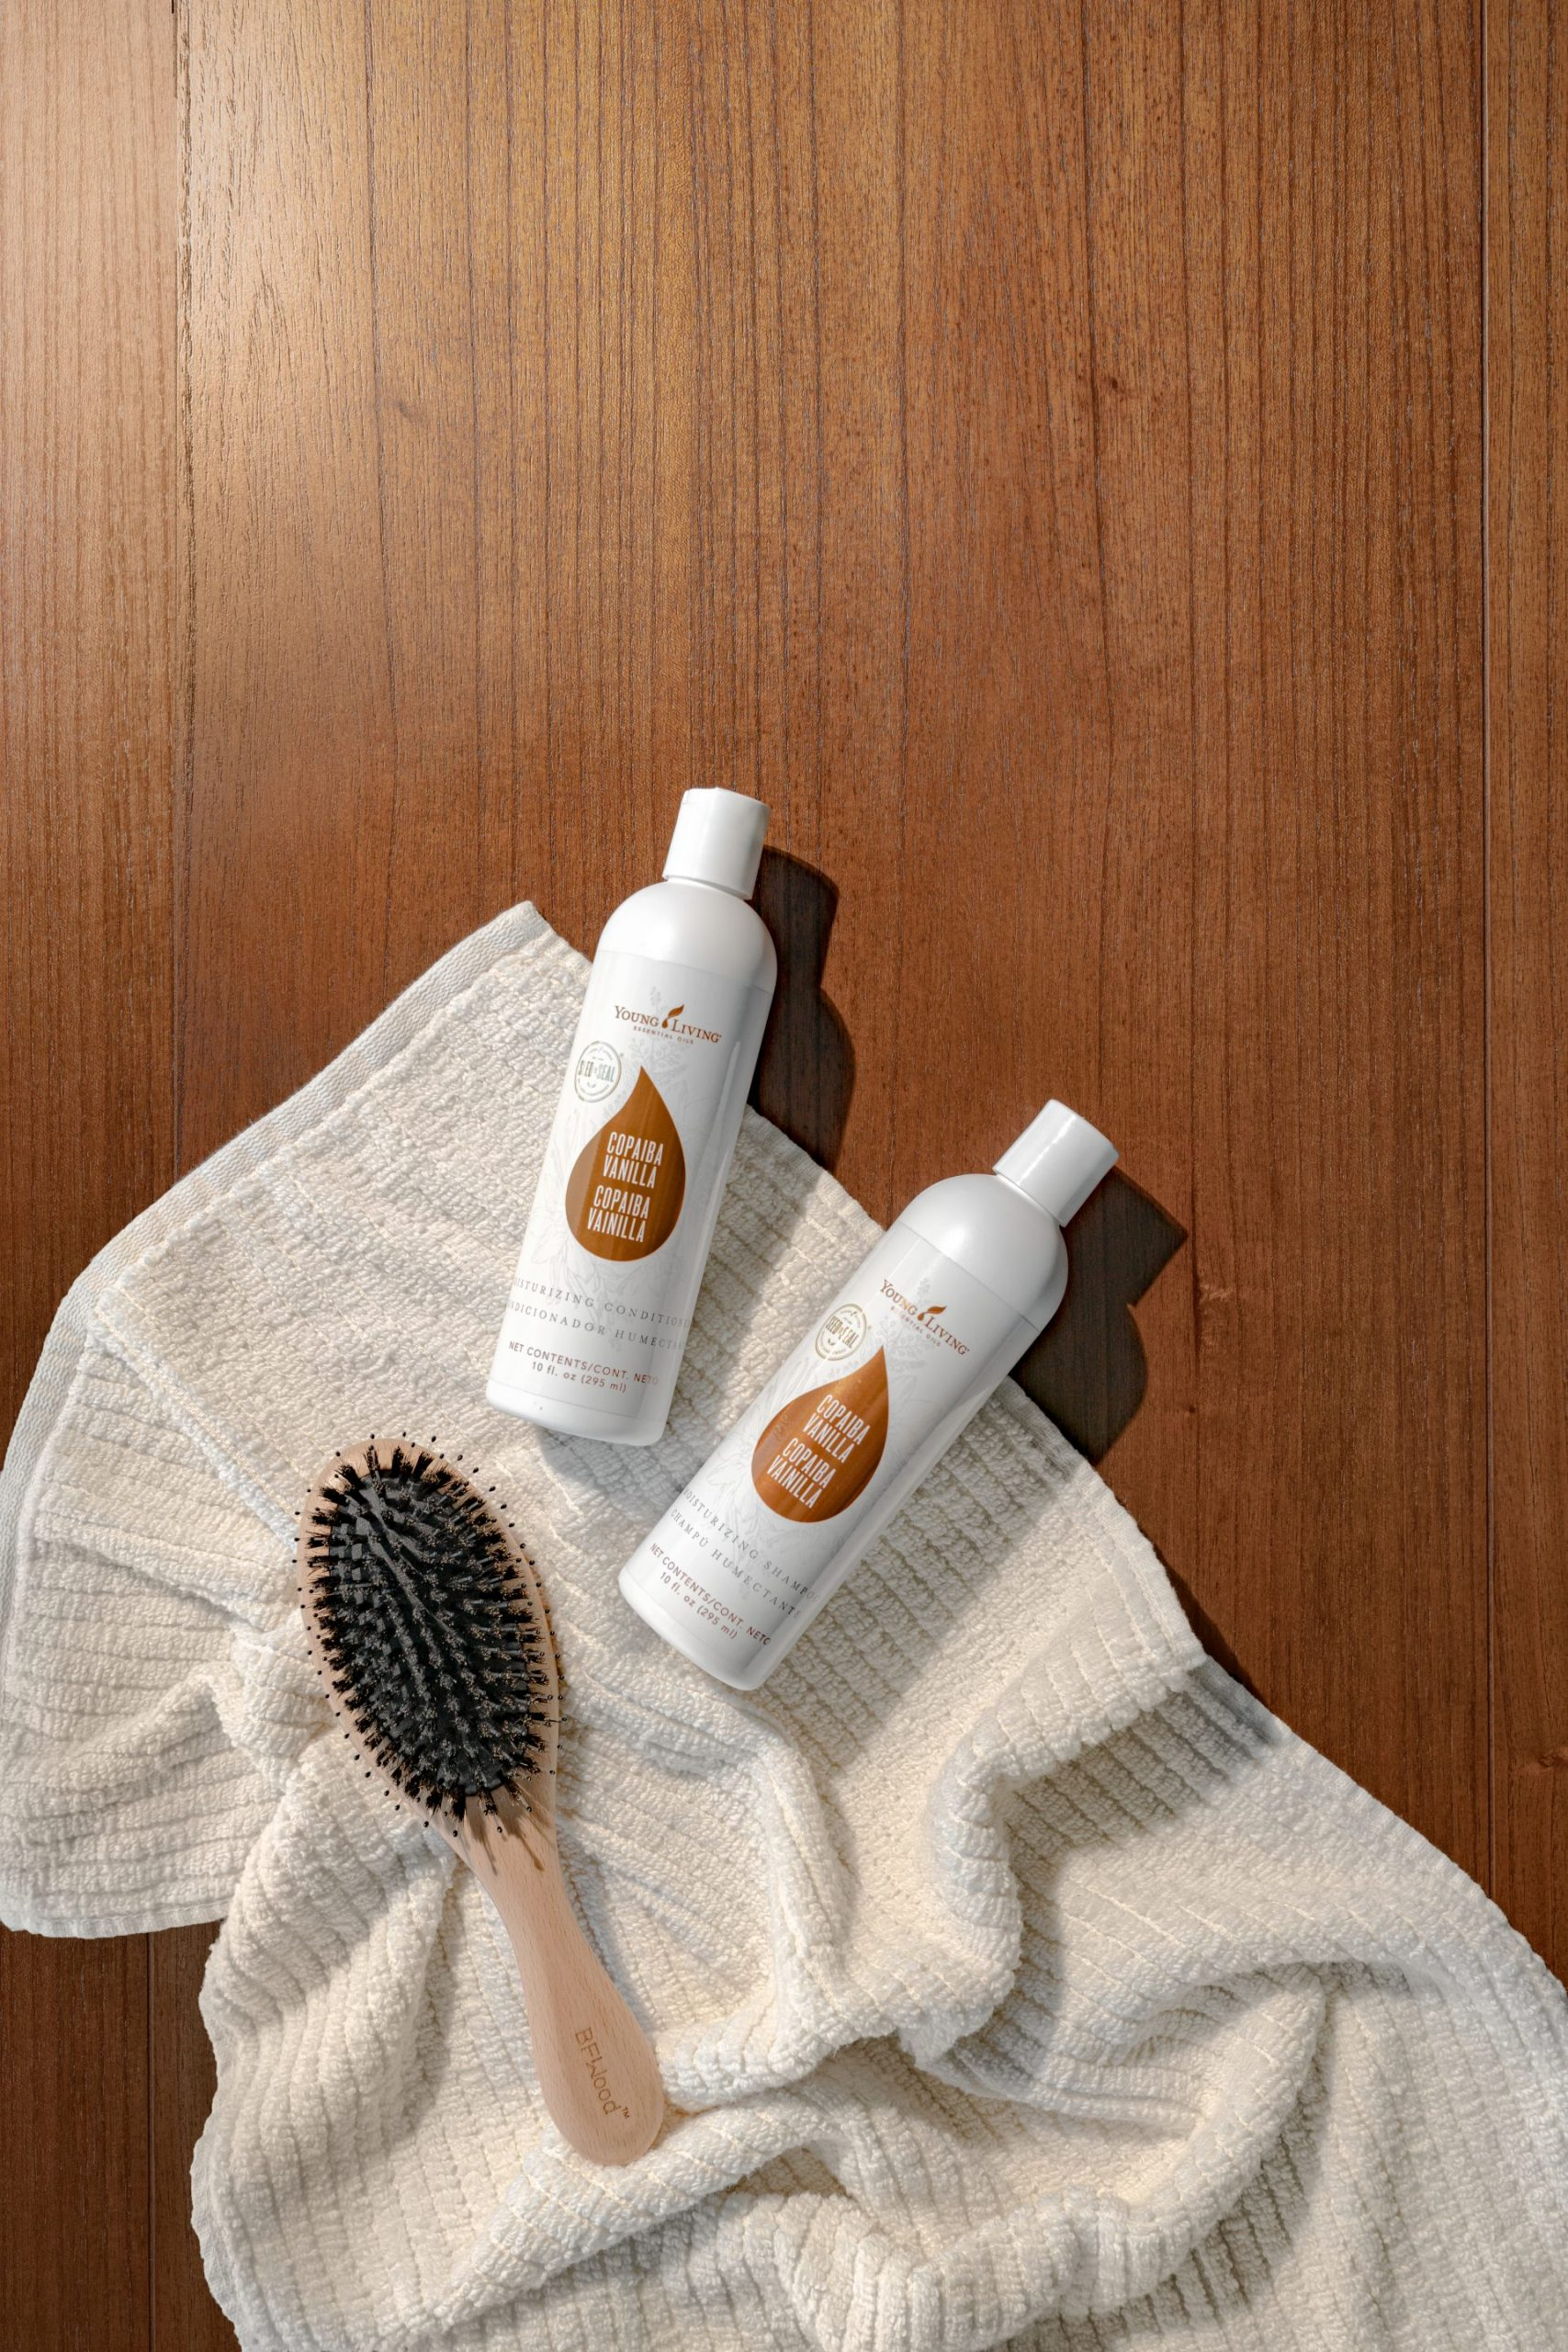 Copaiba Vanilla Shampoo & Conditioner--Young Living Essential Oils